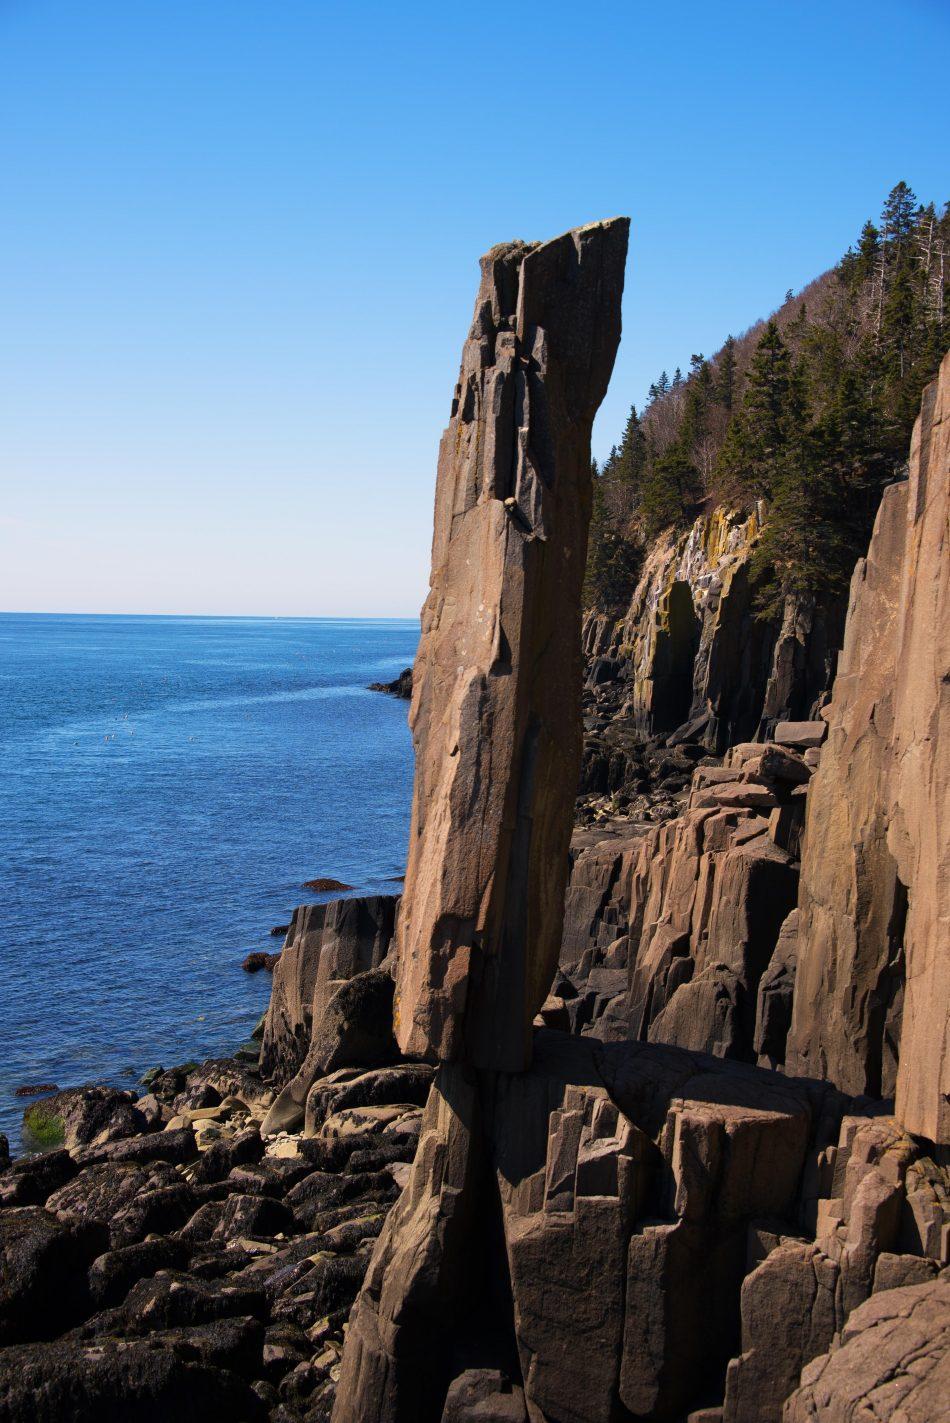 Canada 150 Balancing Rock